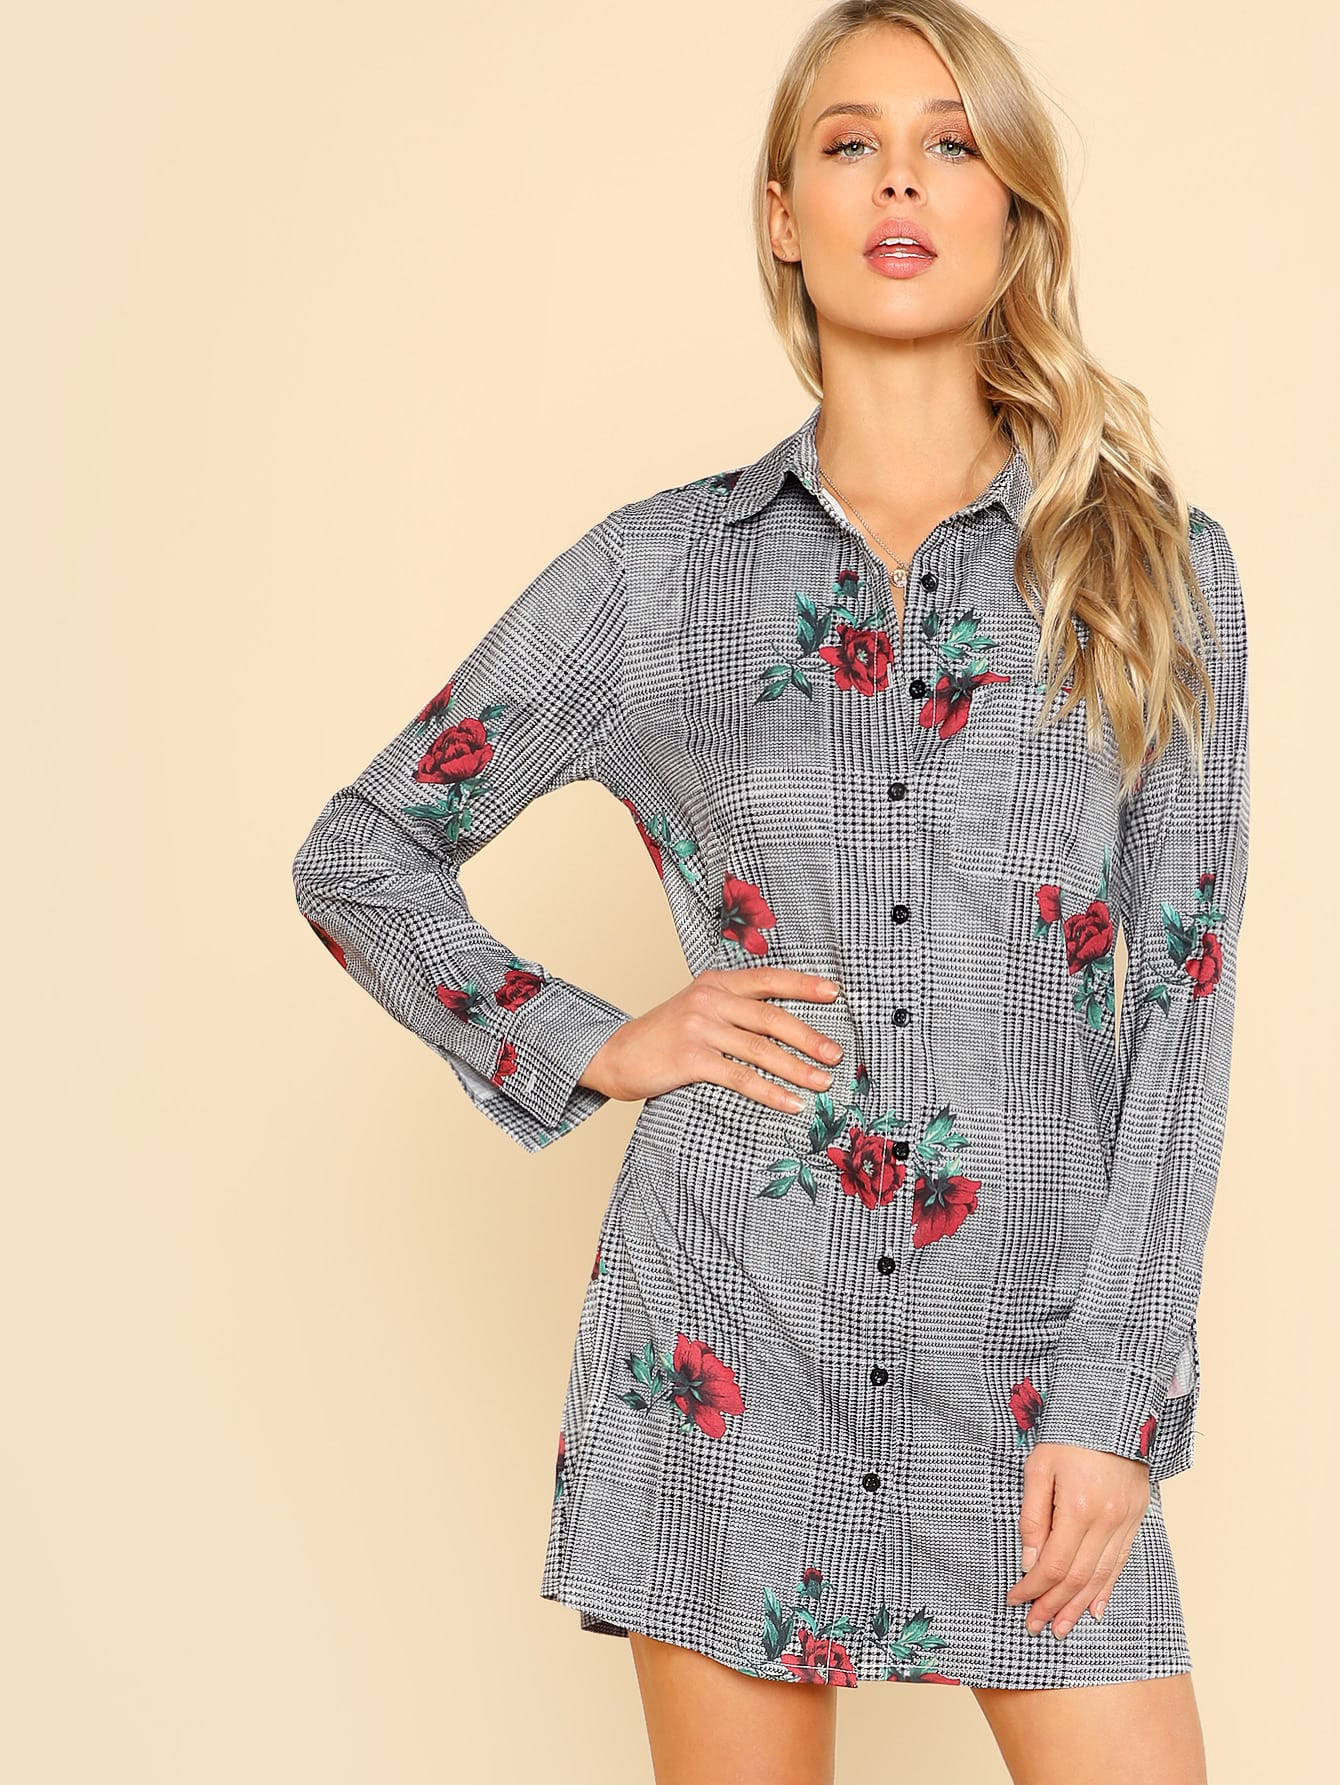 Plaid And Flower Print Shirt Dress